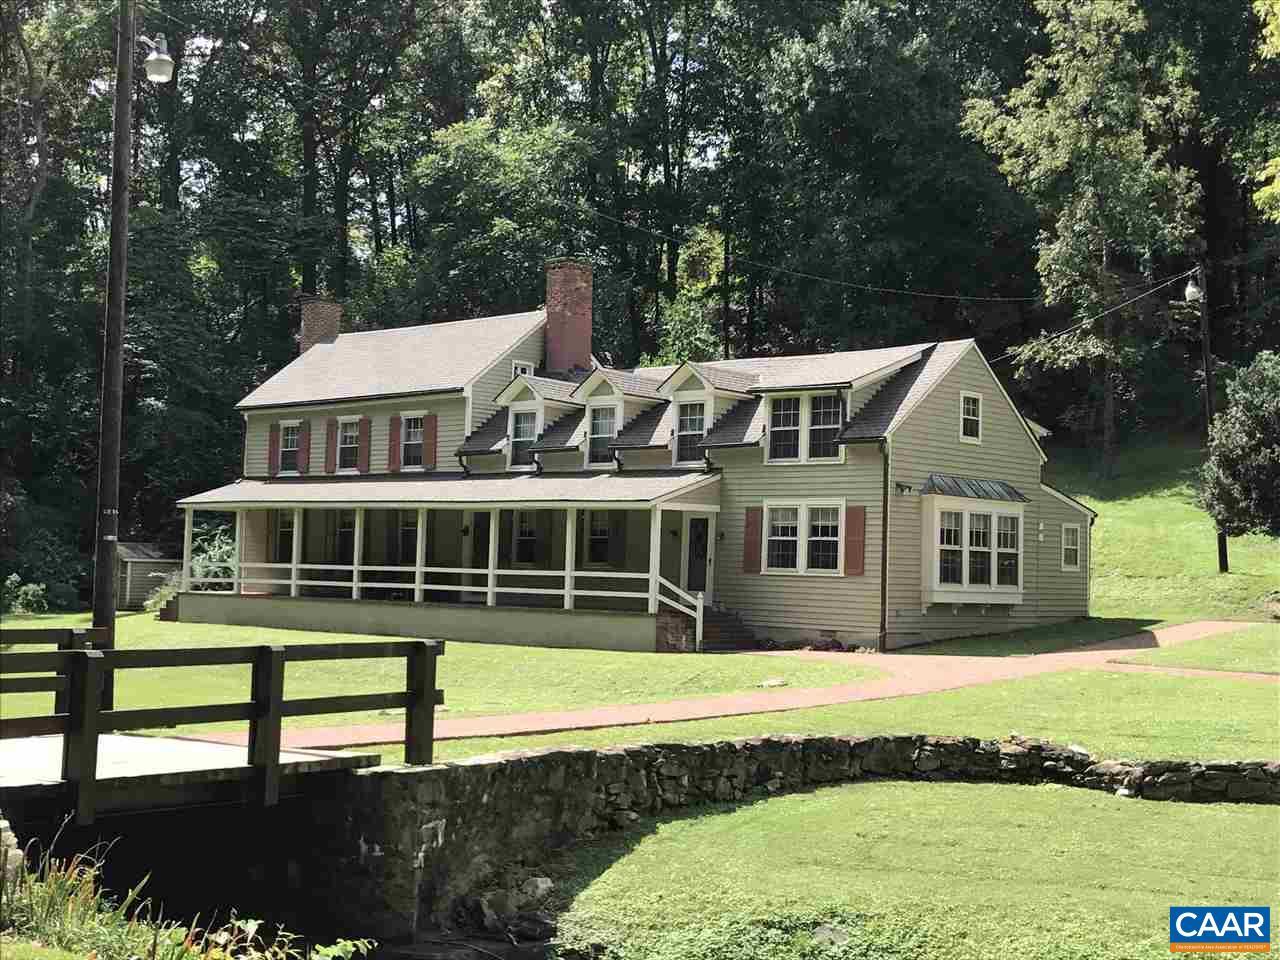 home for sale , MLS #565521, 6562 Rockfish Gap Tpke